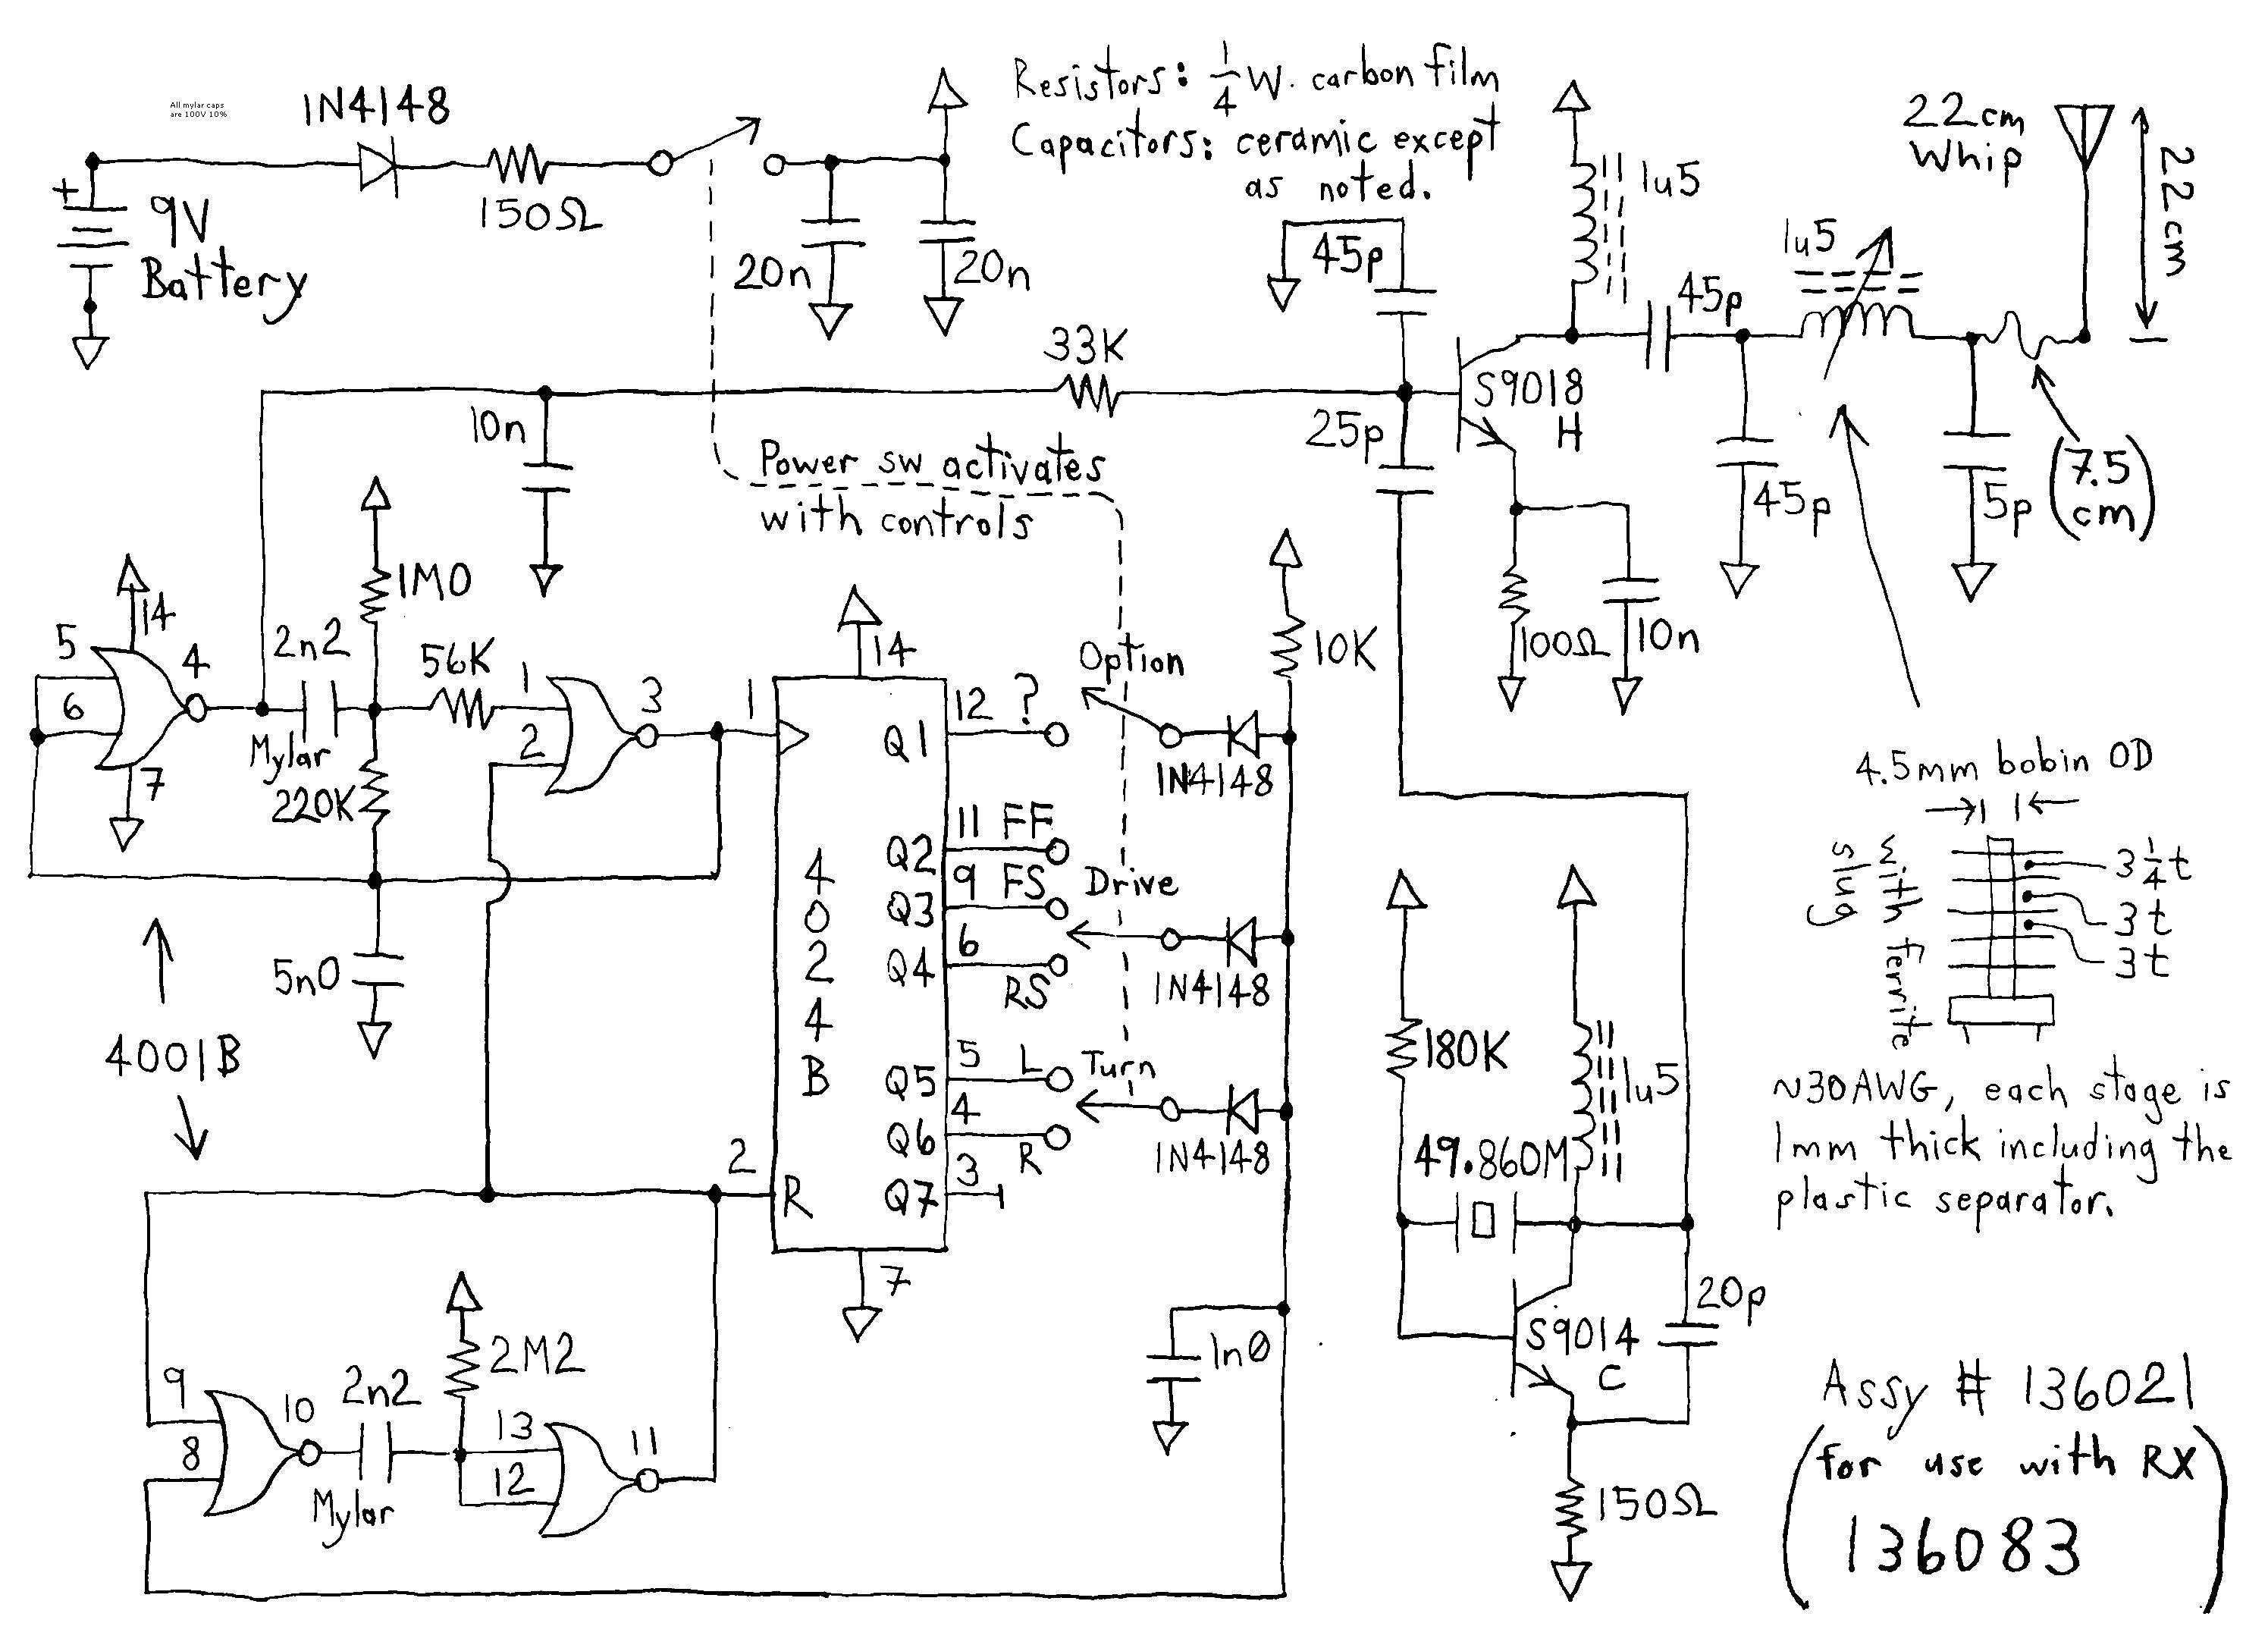 Inspirational 2001 Chevy Blazer Wiring Diagram In 2020 Electrical Wiring Diagram Electrical Diagram Diagram